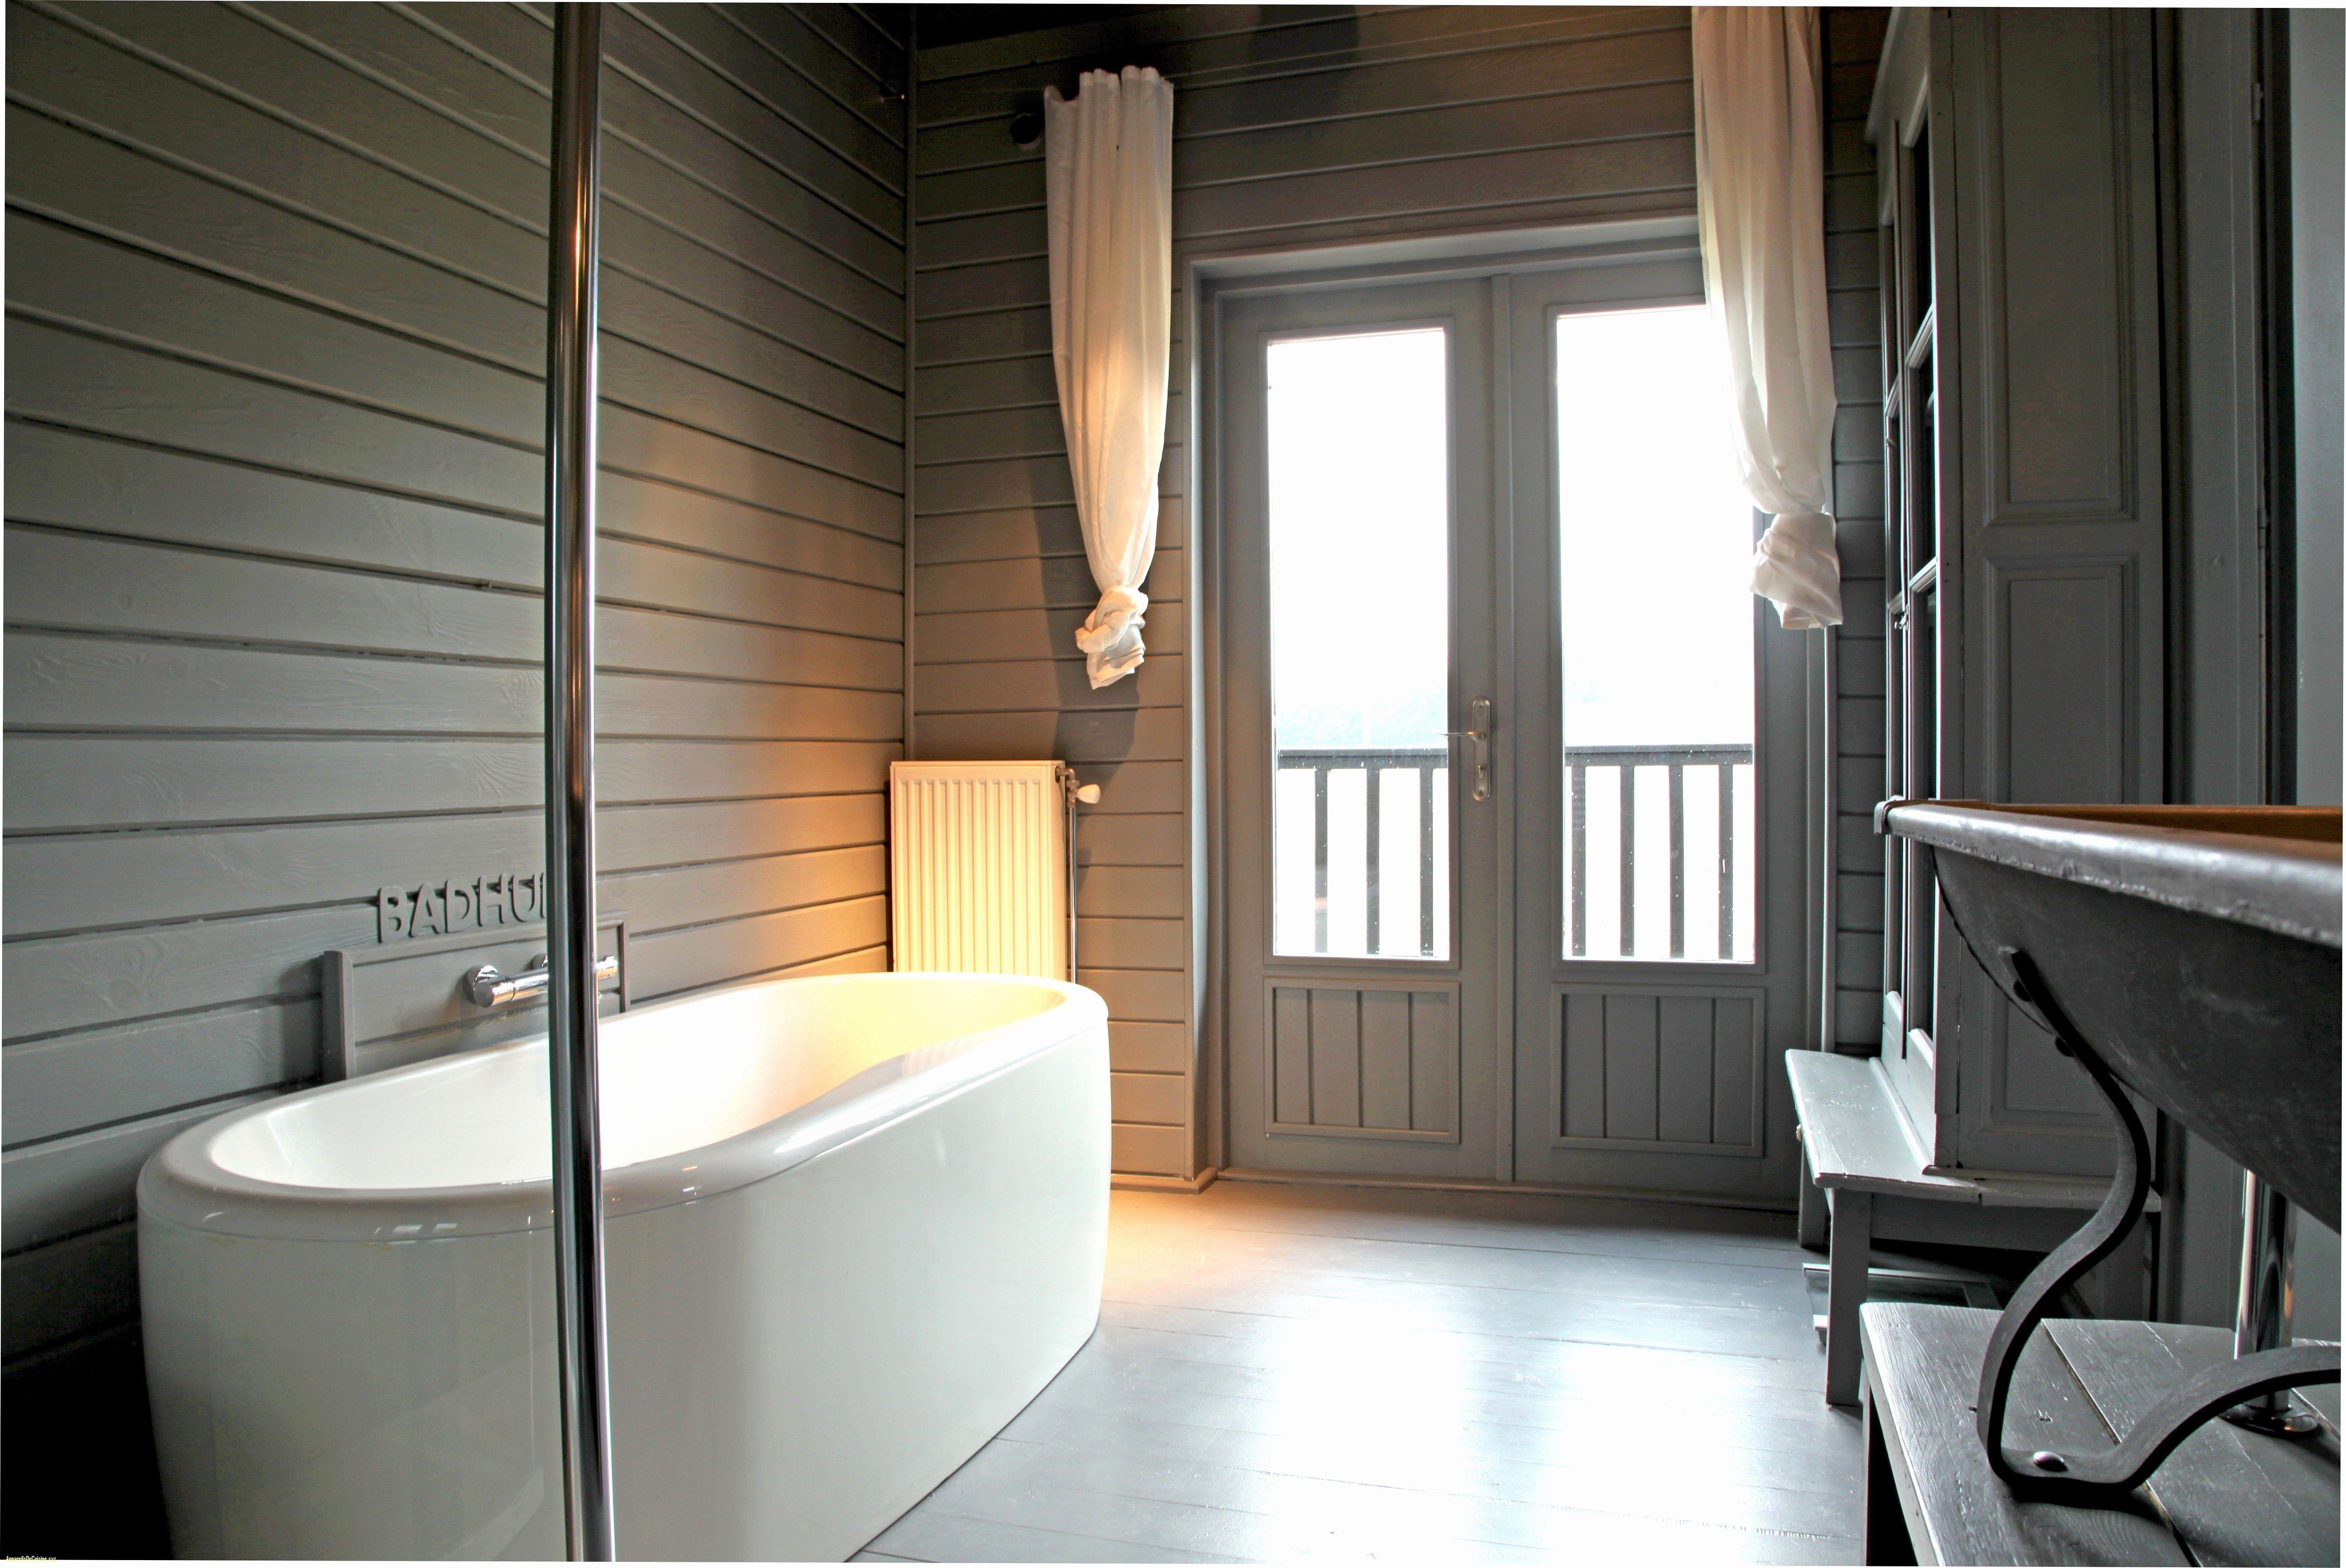 Bain Couleur Idees Inspirantes Meilleur Meuble Salle Meilleur Meuble Salle De Bain Couleur In 2020 Bathroom Style Creative Bathroom Design Beadboard Wainscoting